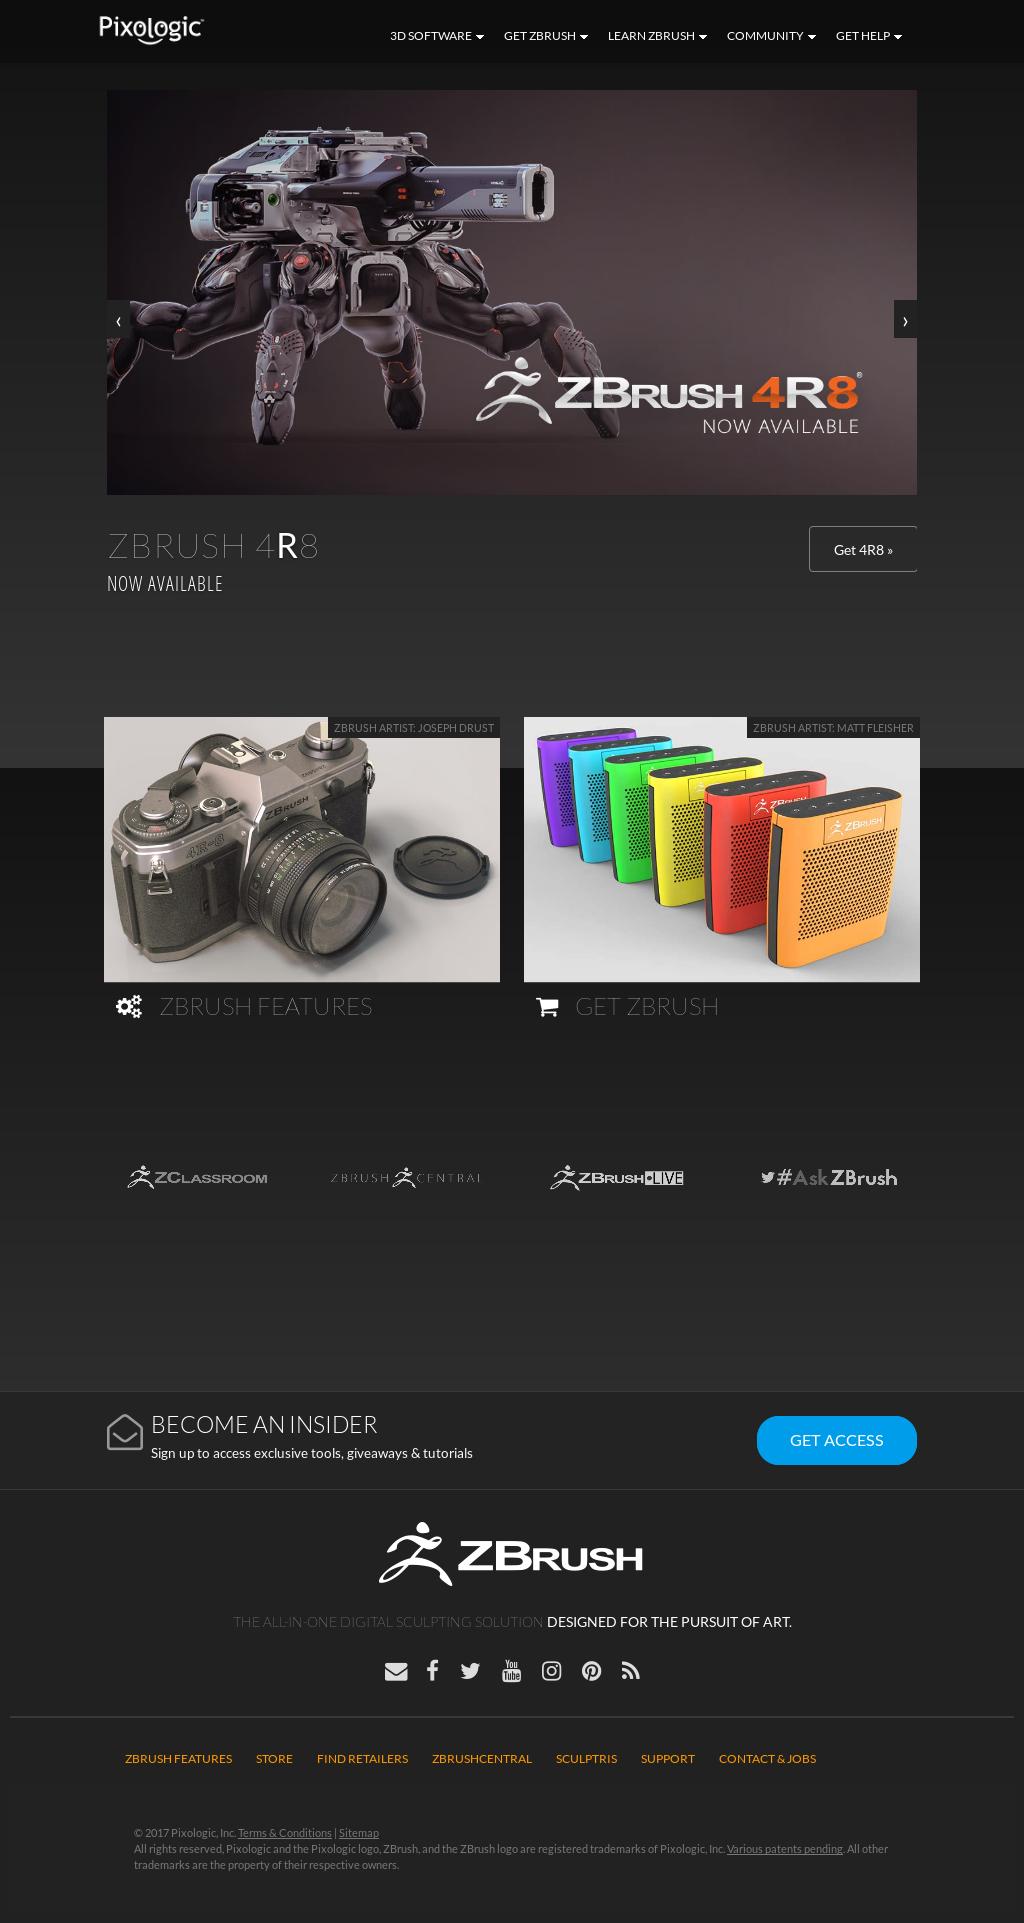 Owler Reports - Pixologic: Pixologic ZBrush 4R8 Update 2 Available